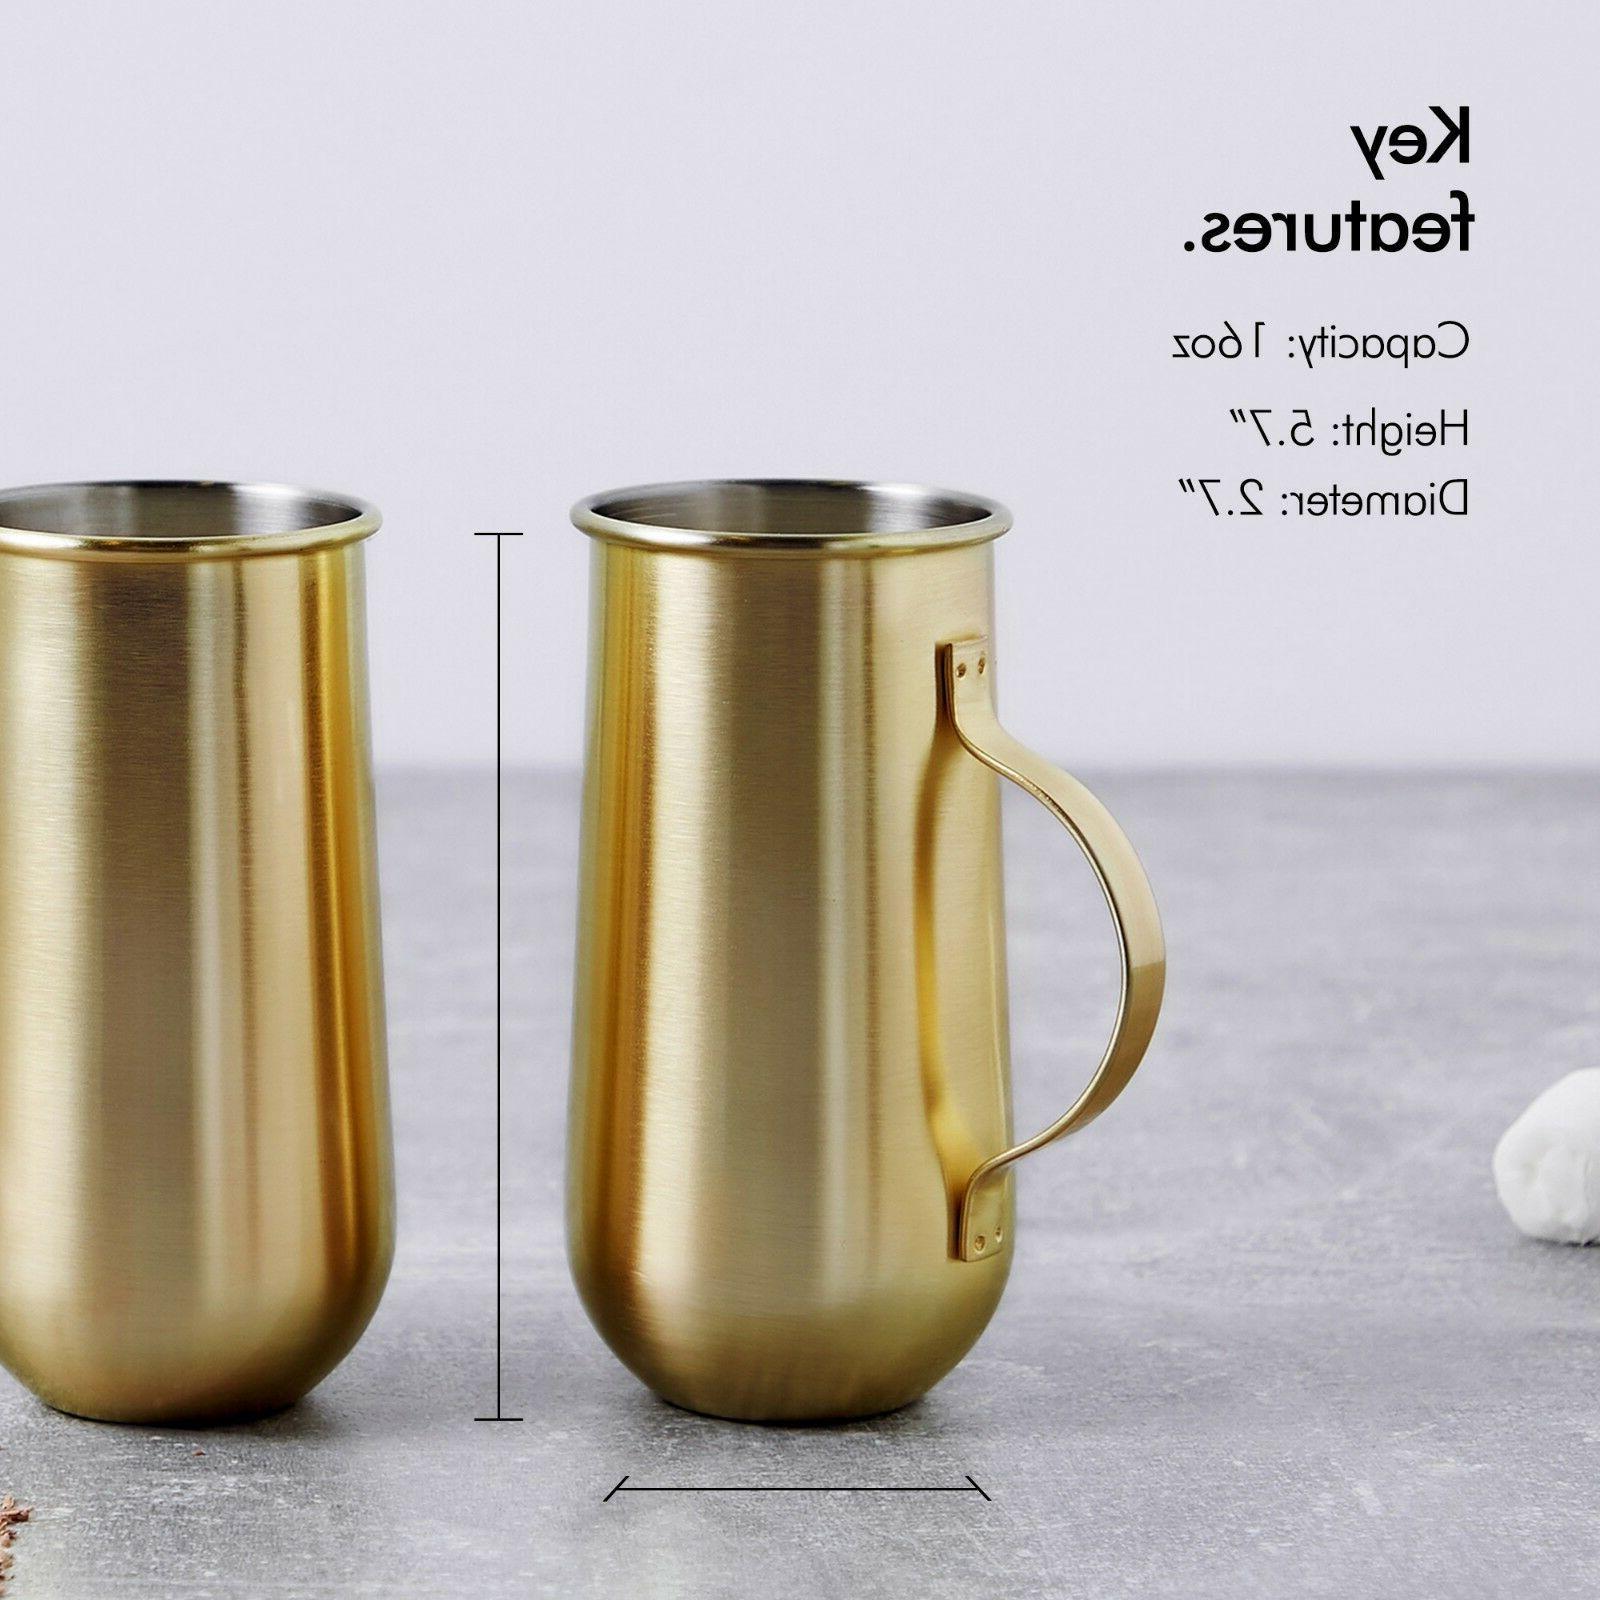 VonShef Set Gold Mugs - and Gift Boxed